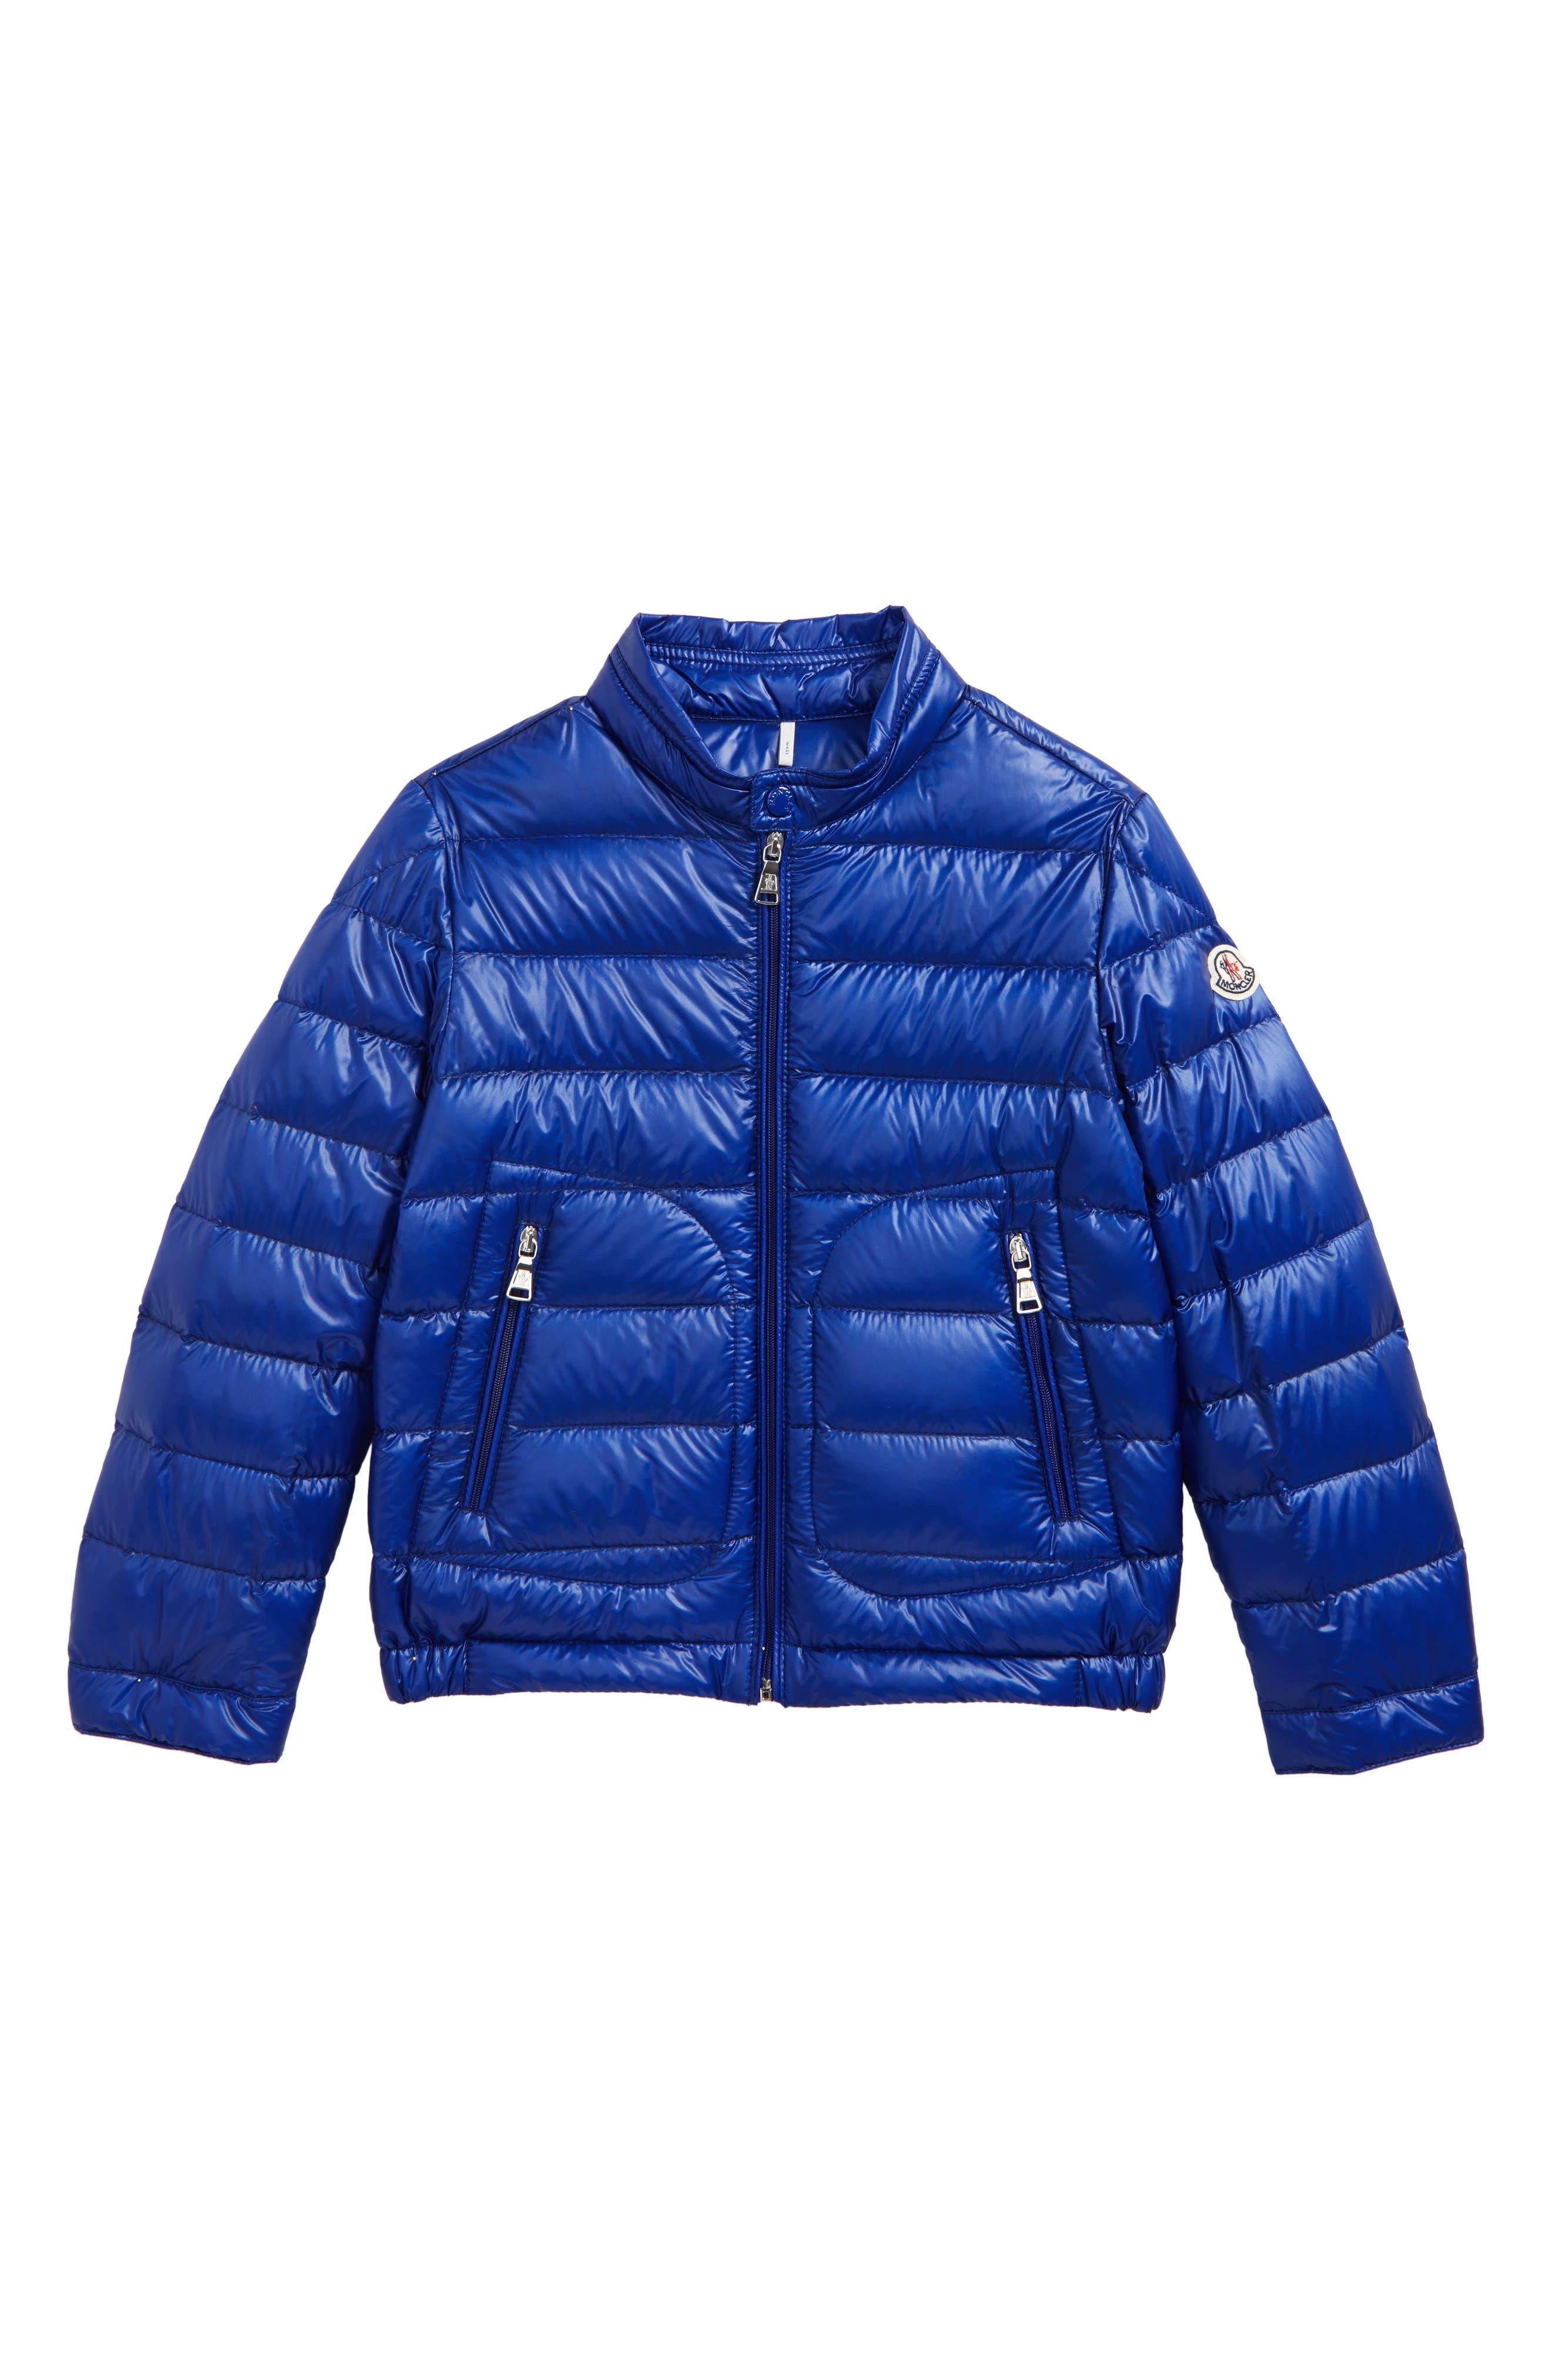 Acorus Goose Down Jacket,                             Main thumbnail 1, color,                             Bright Blue